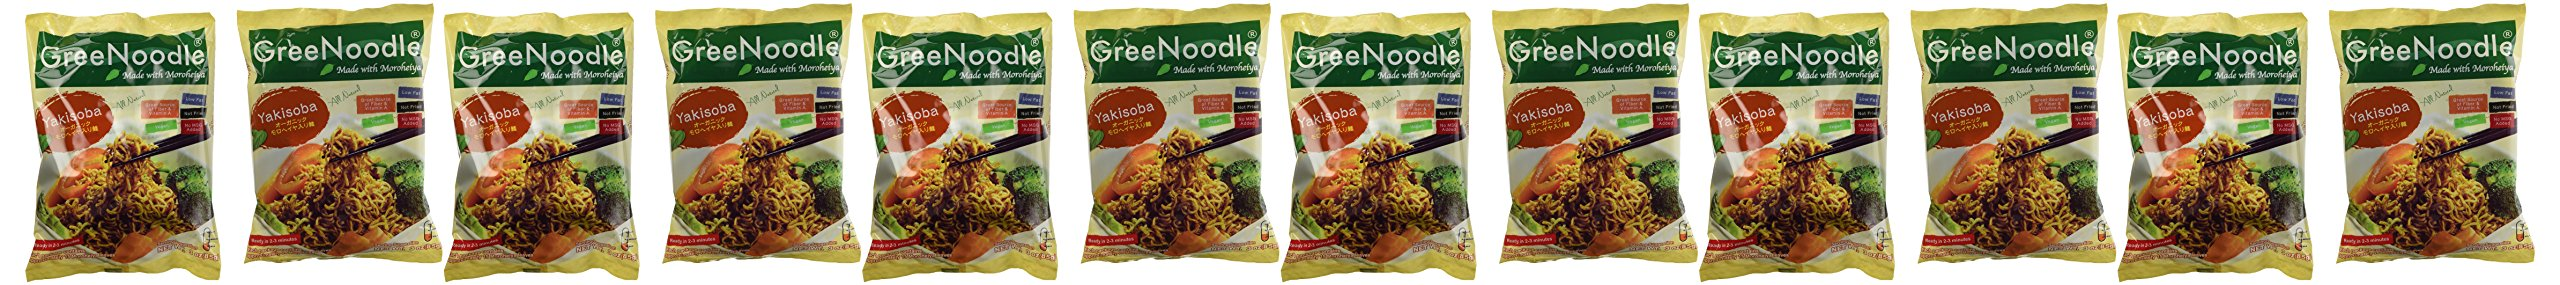 GreeNoodle Yakisoba Noodles, 3 oz